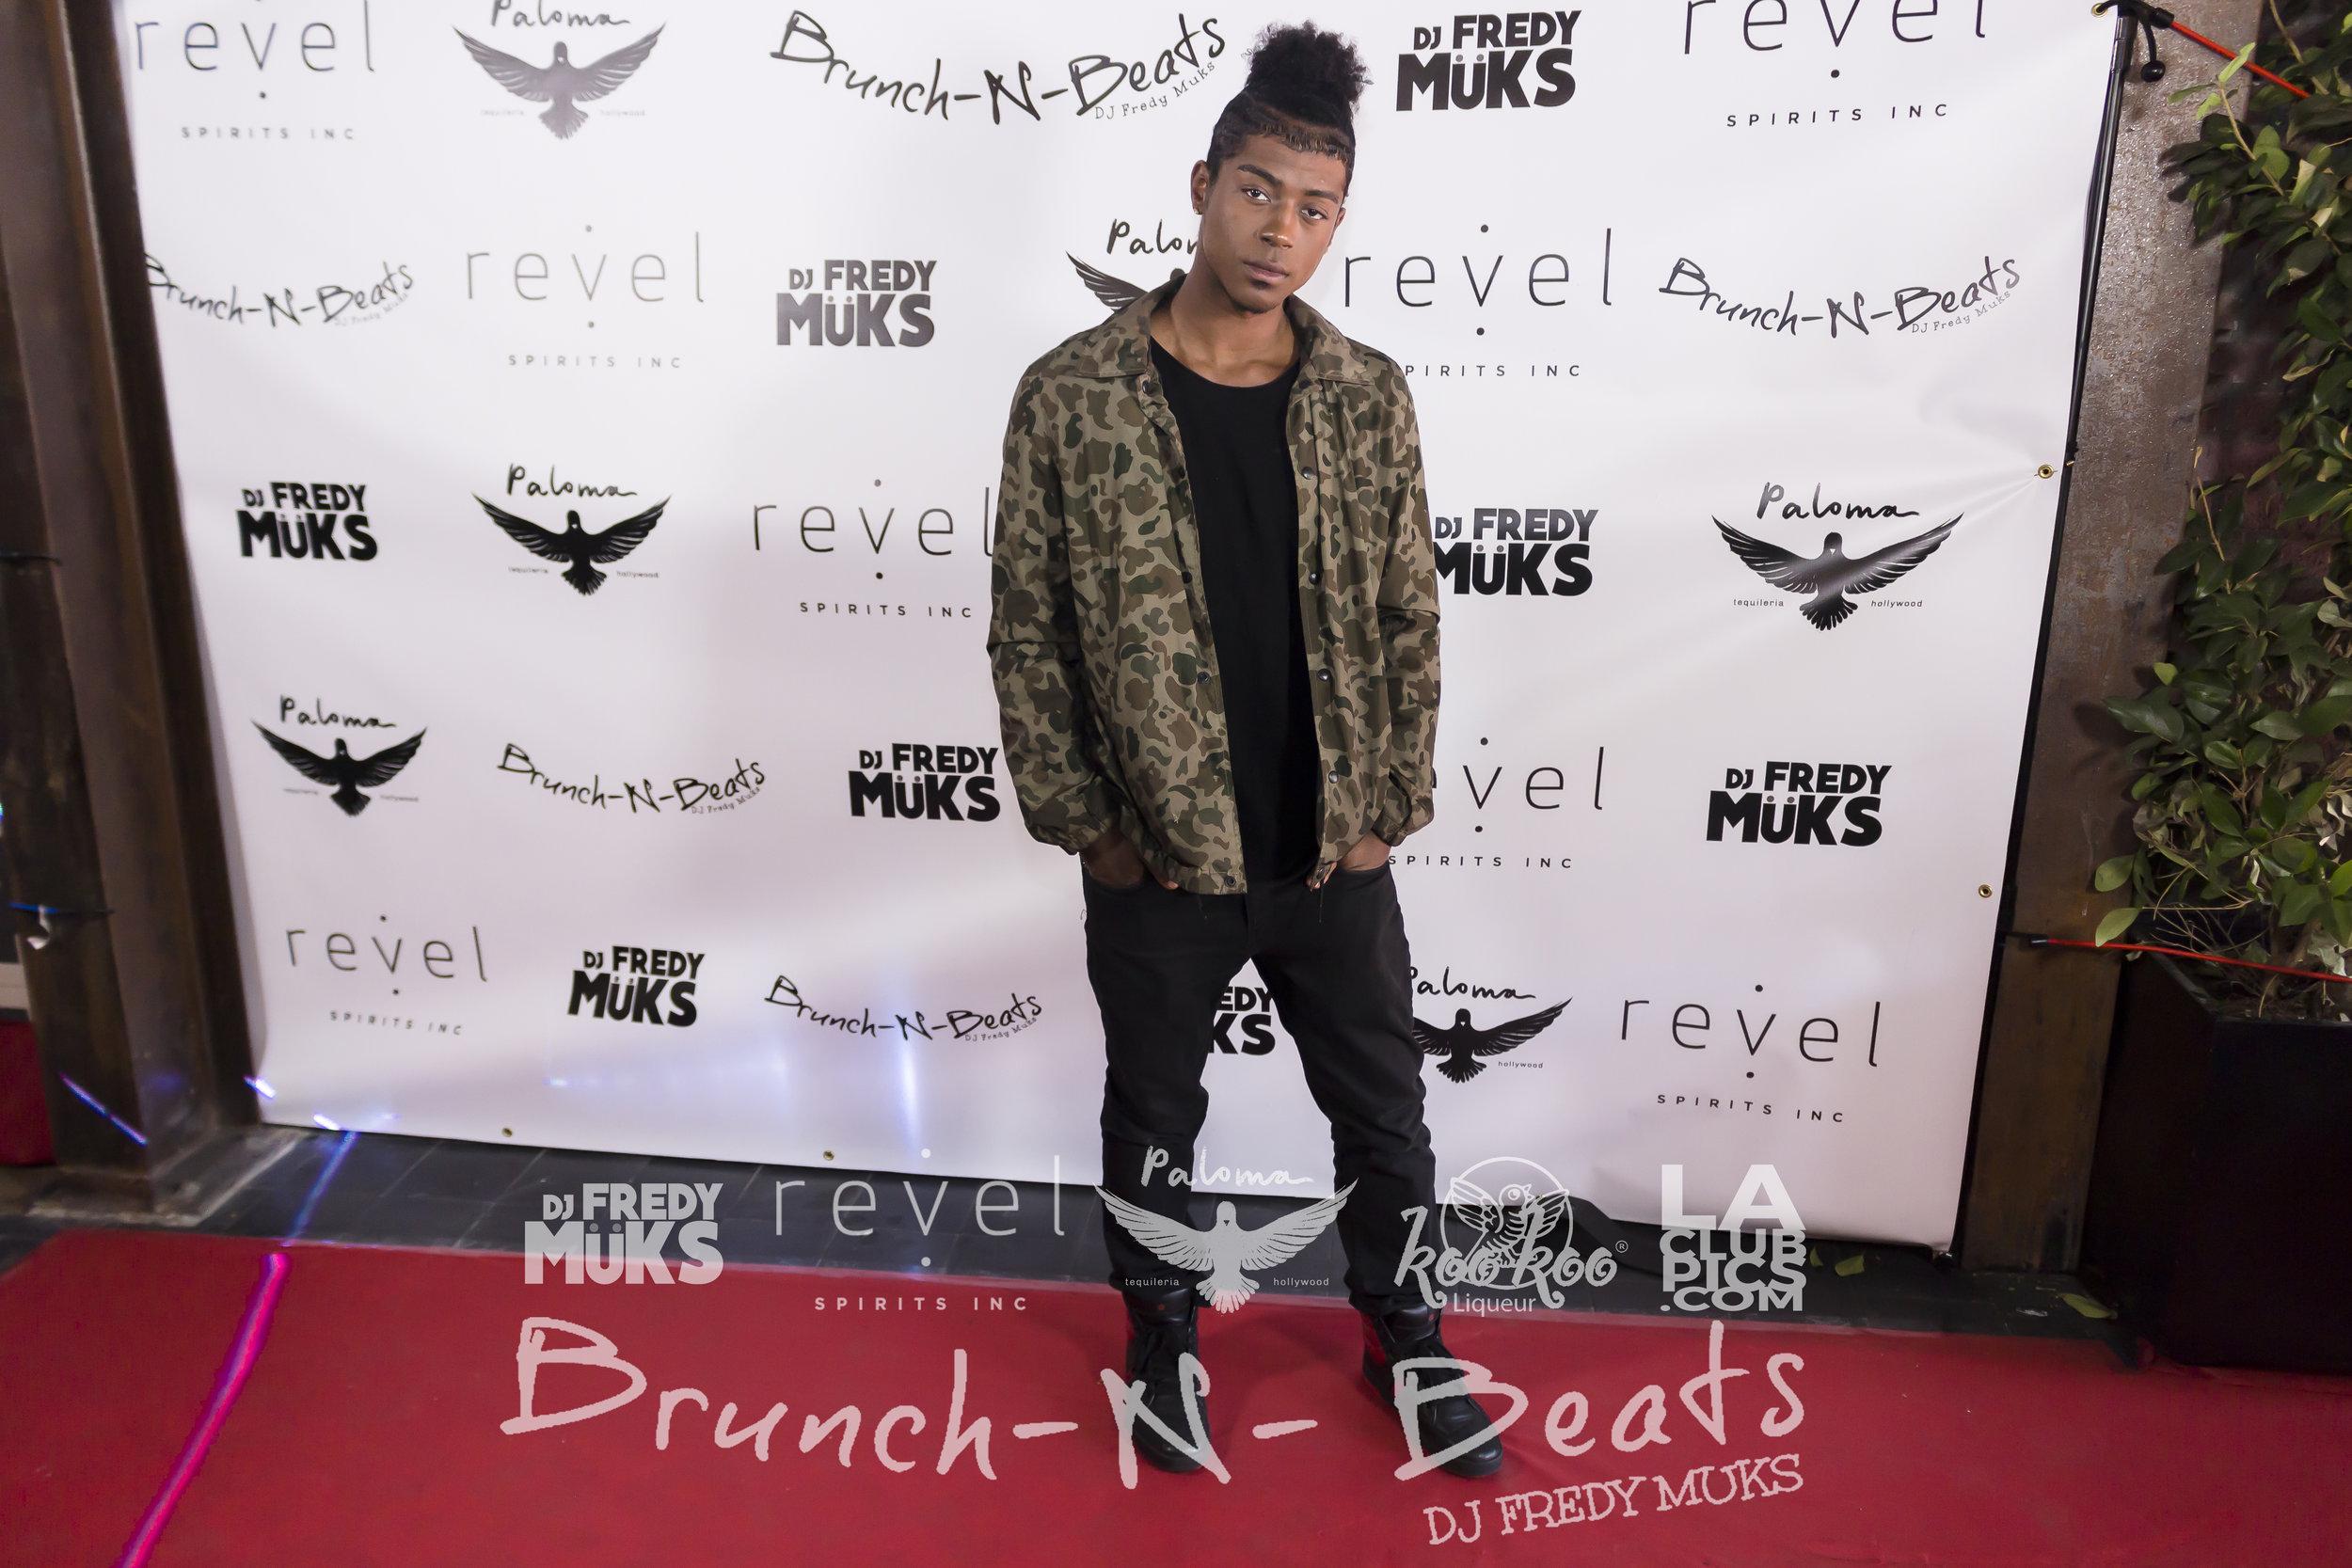 Brunch-N-Beats - Paloma Hollywood - 02-25-18.jpg